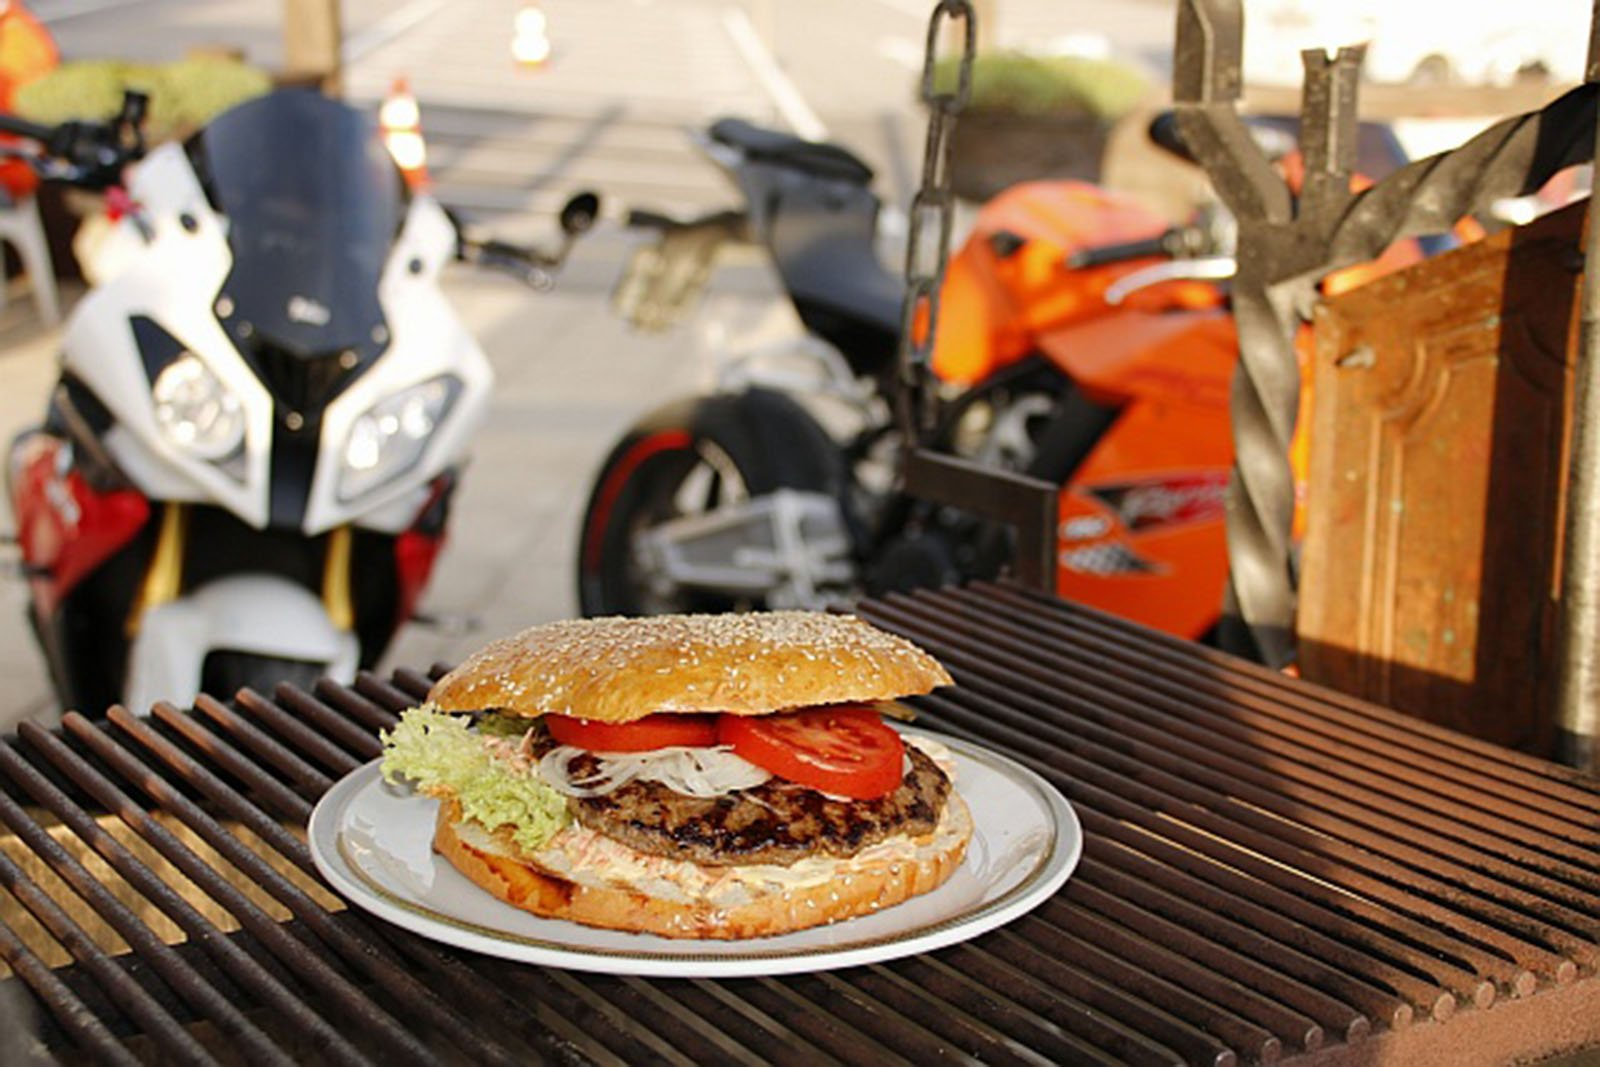 Am Töff Treff im Arvenbüel gibt es den Big Büel Burger